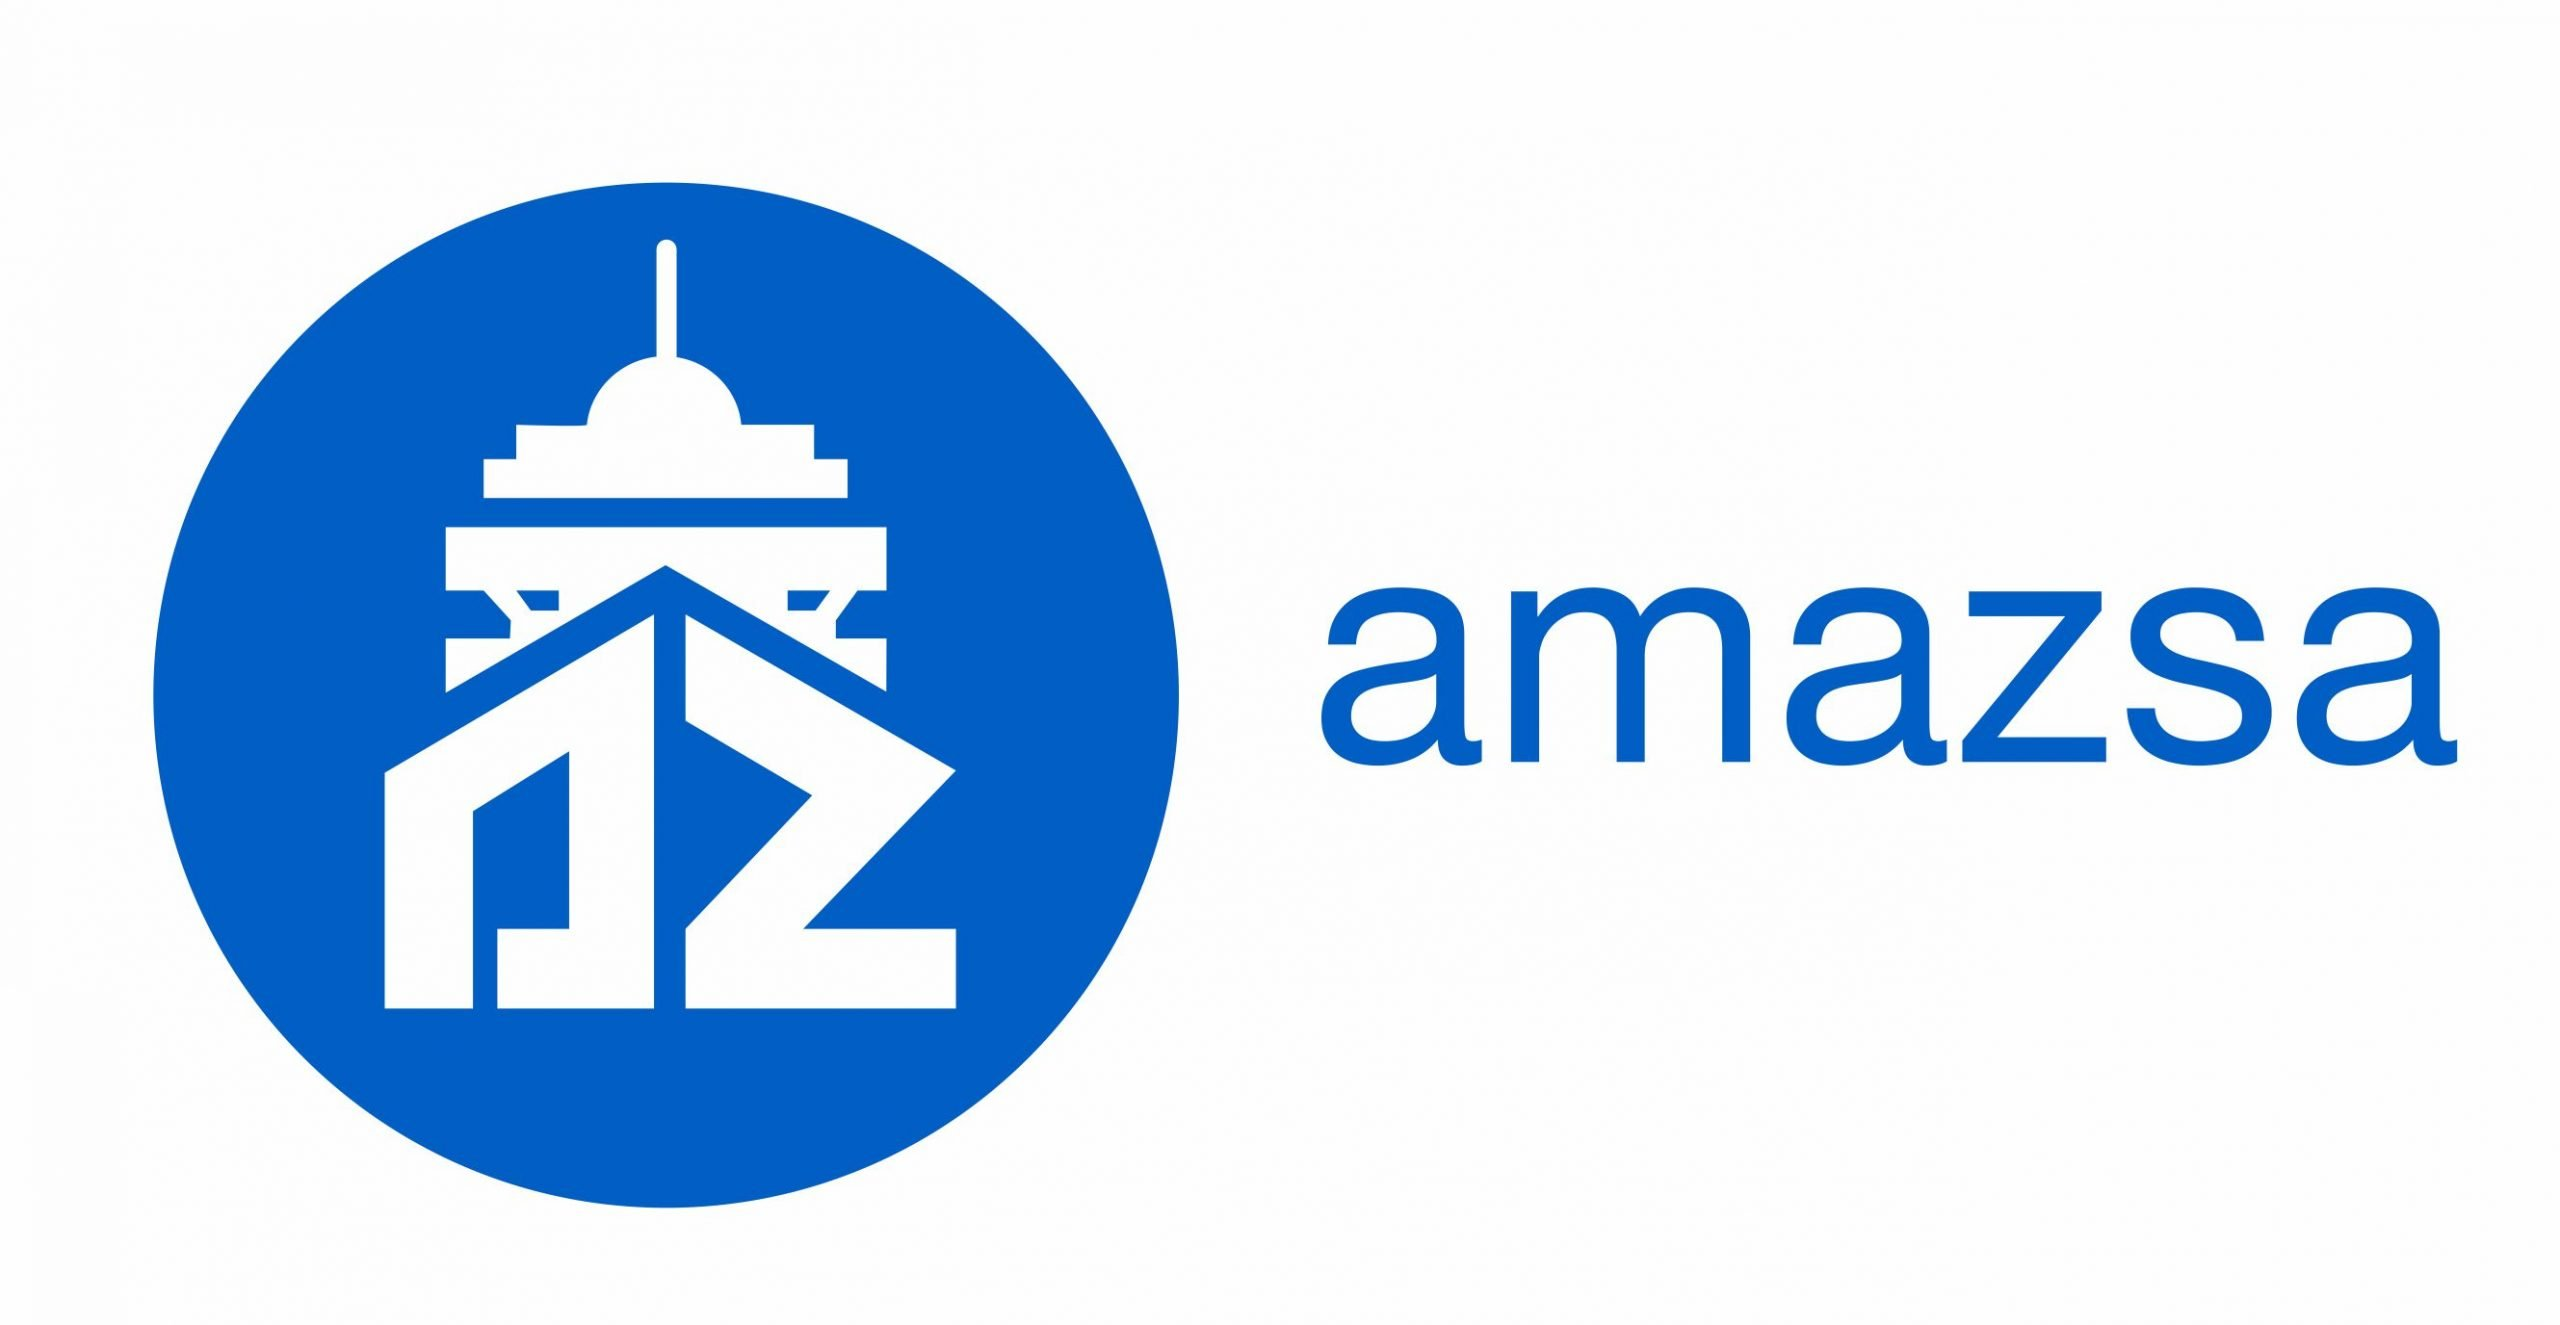 Amazsa